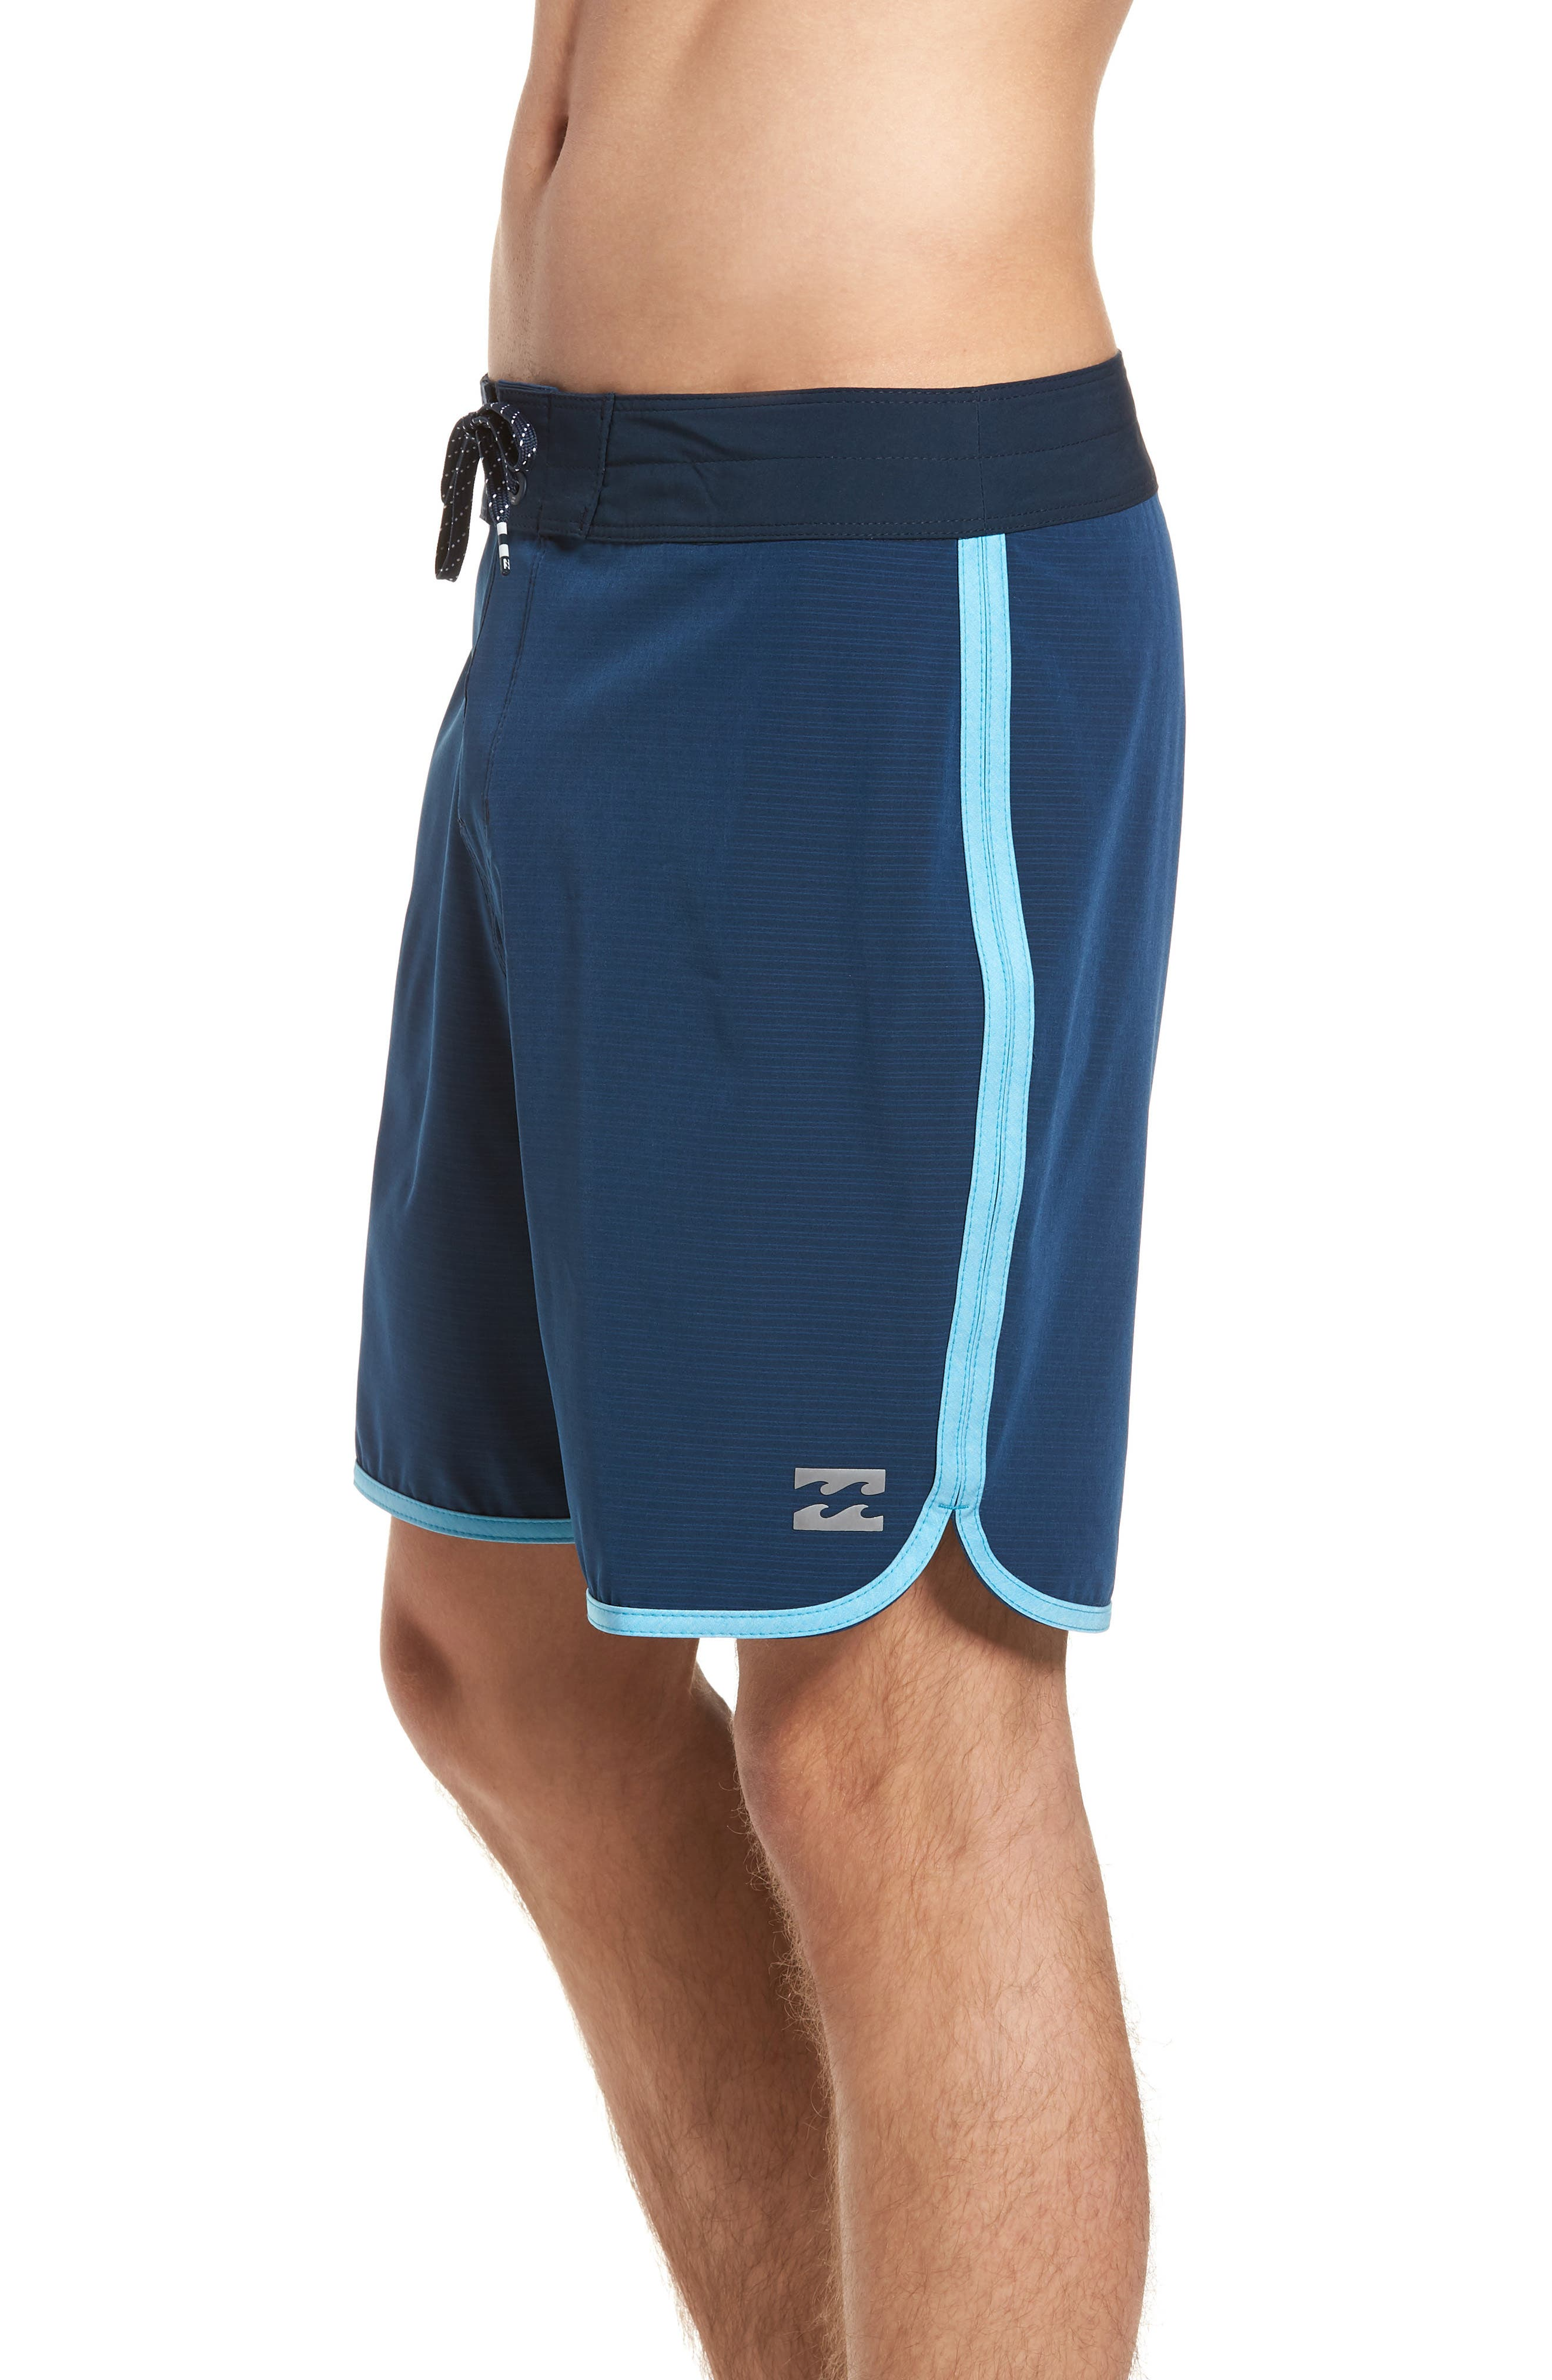 73 X Short Board Shorts,                             Alternate thumbnail 3, color,                             Navy